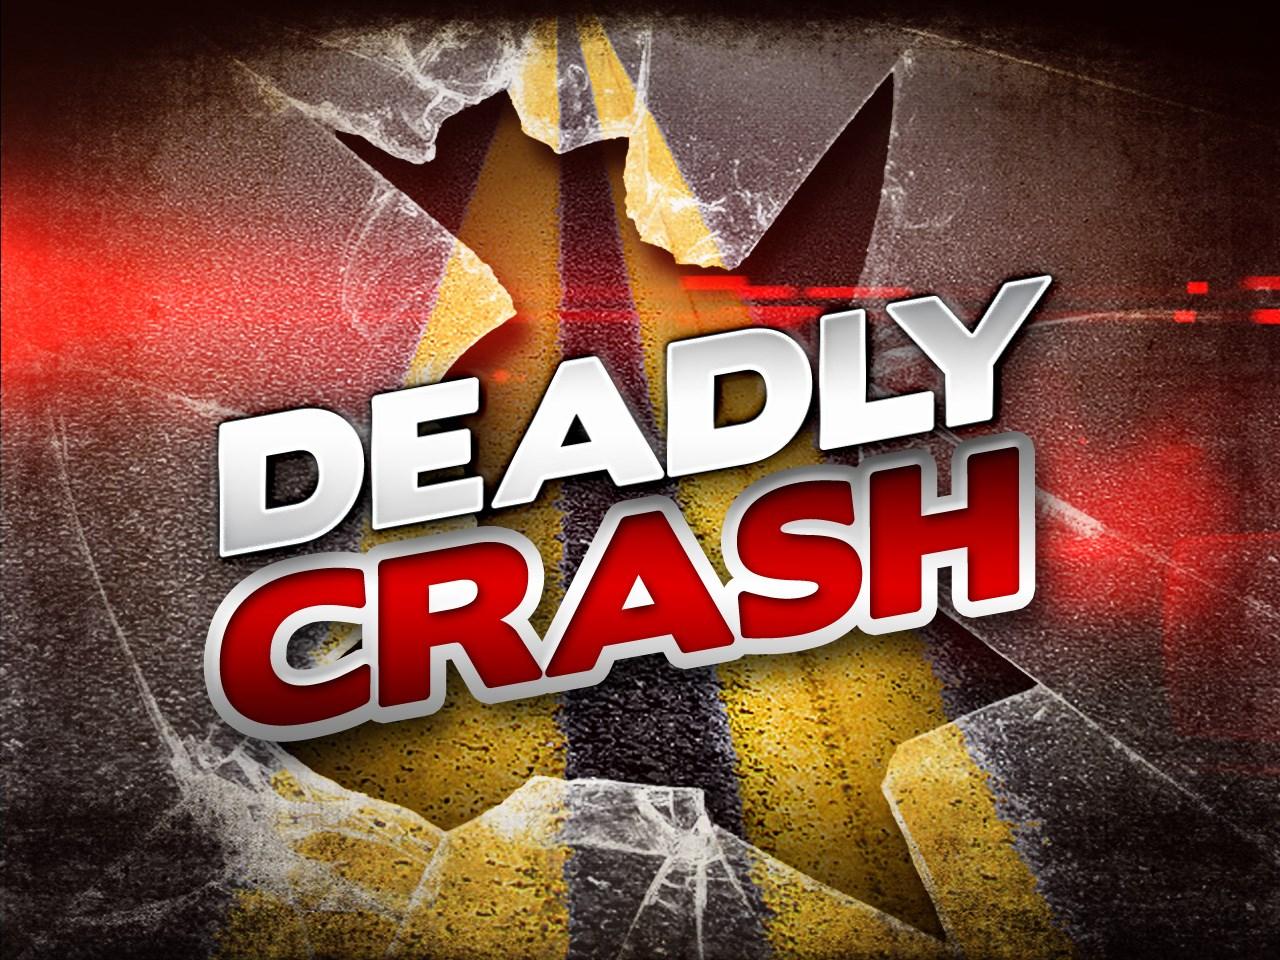 DEADLY CRASH (TEXT)_1553294804148.jpg.jpg